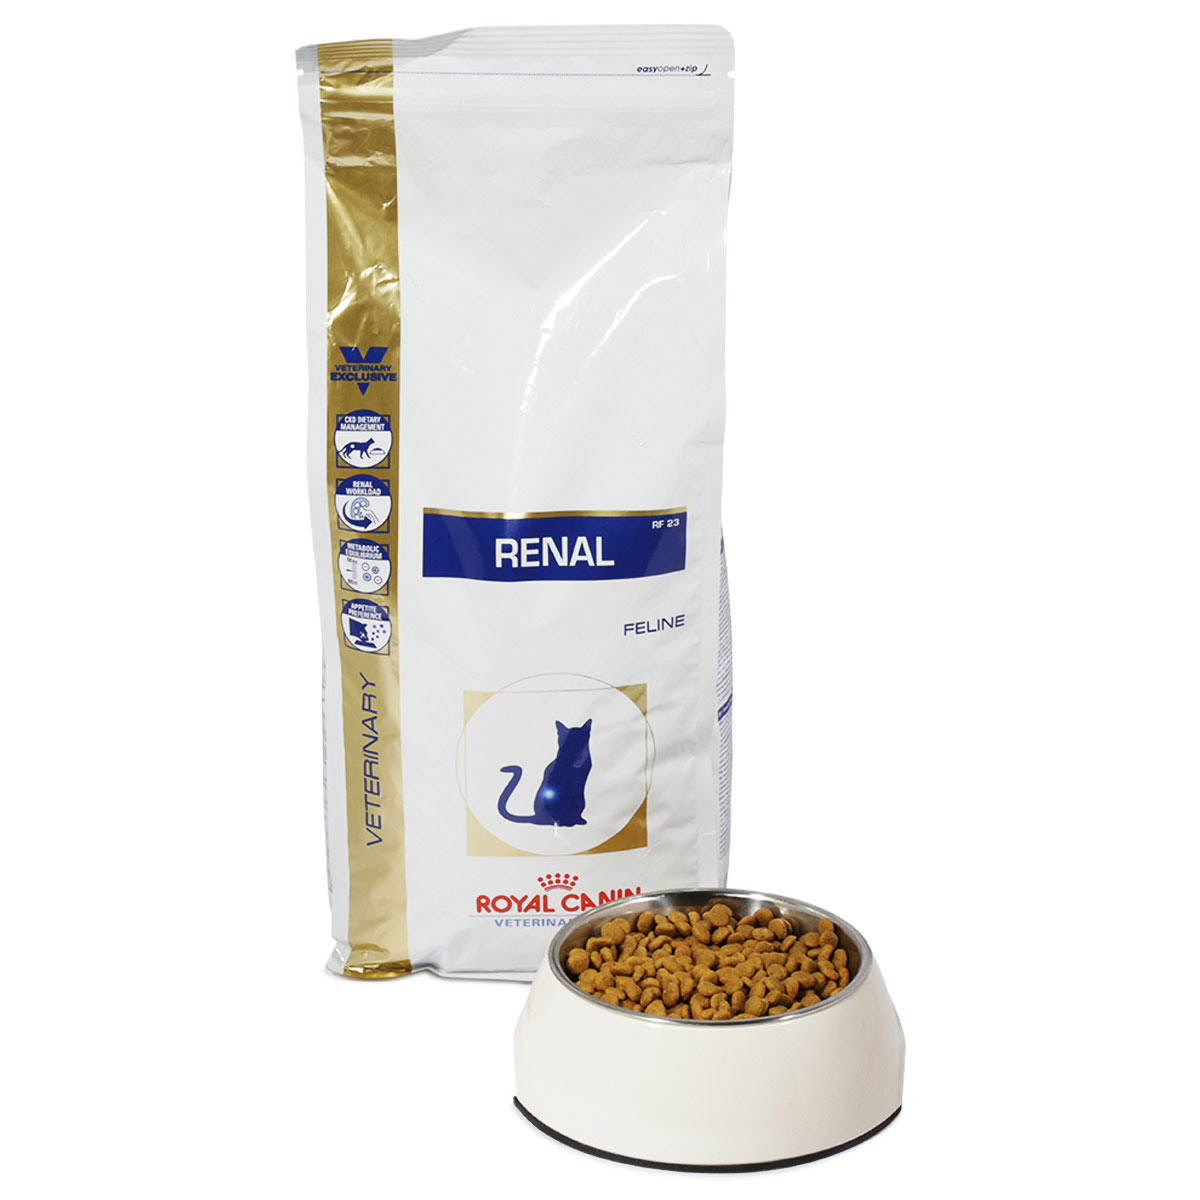 royal canin vet diet renal rf 23 g nstig kaufen bei zooroyal. Black Bedroom Furniture Sets. Home Design Ideas